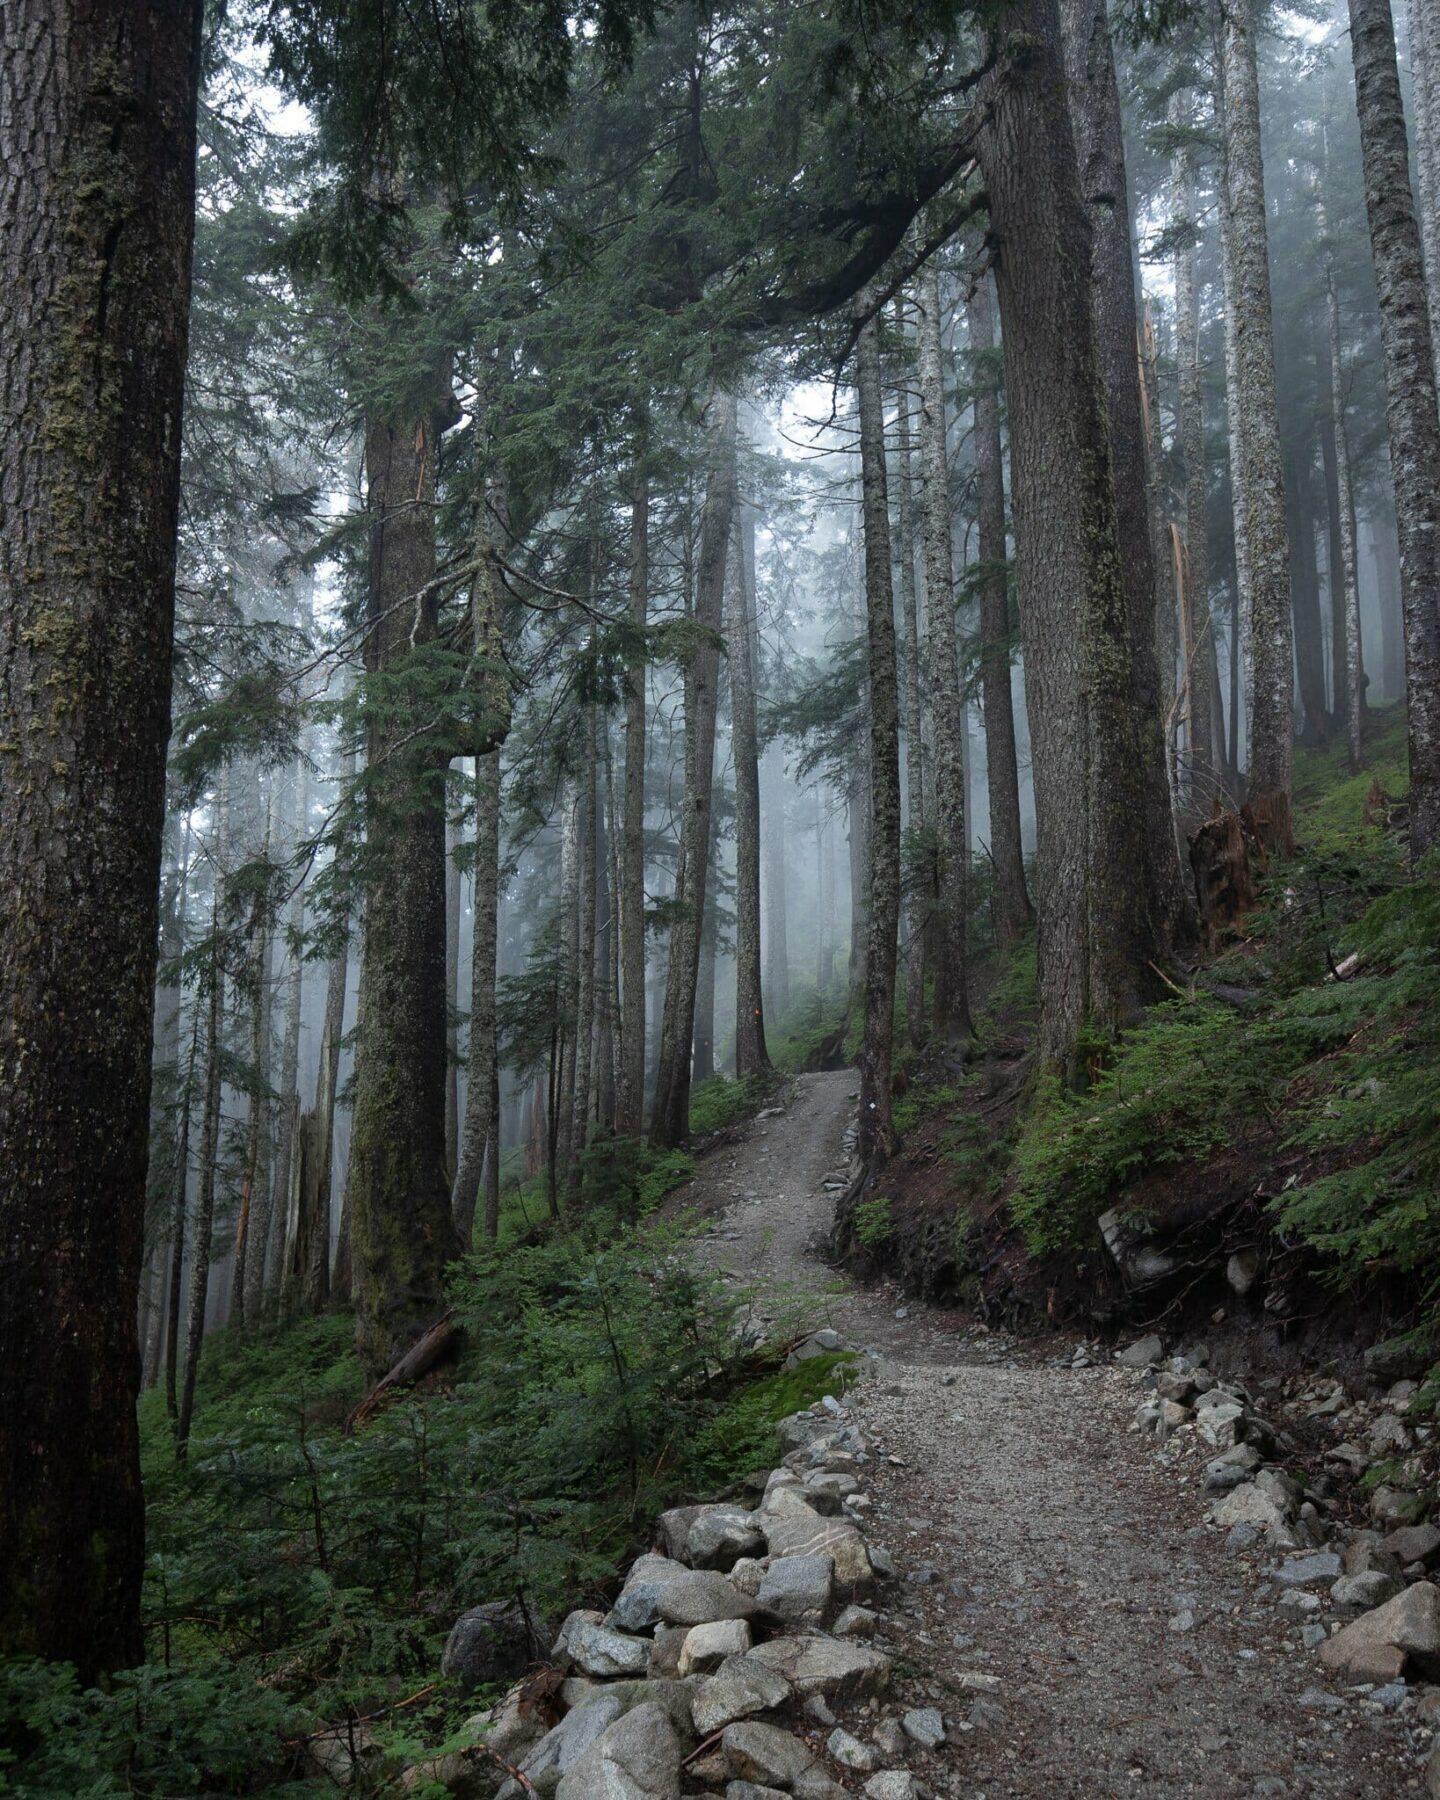 Beautiful hikes around Vancouver - St Marks Summit